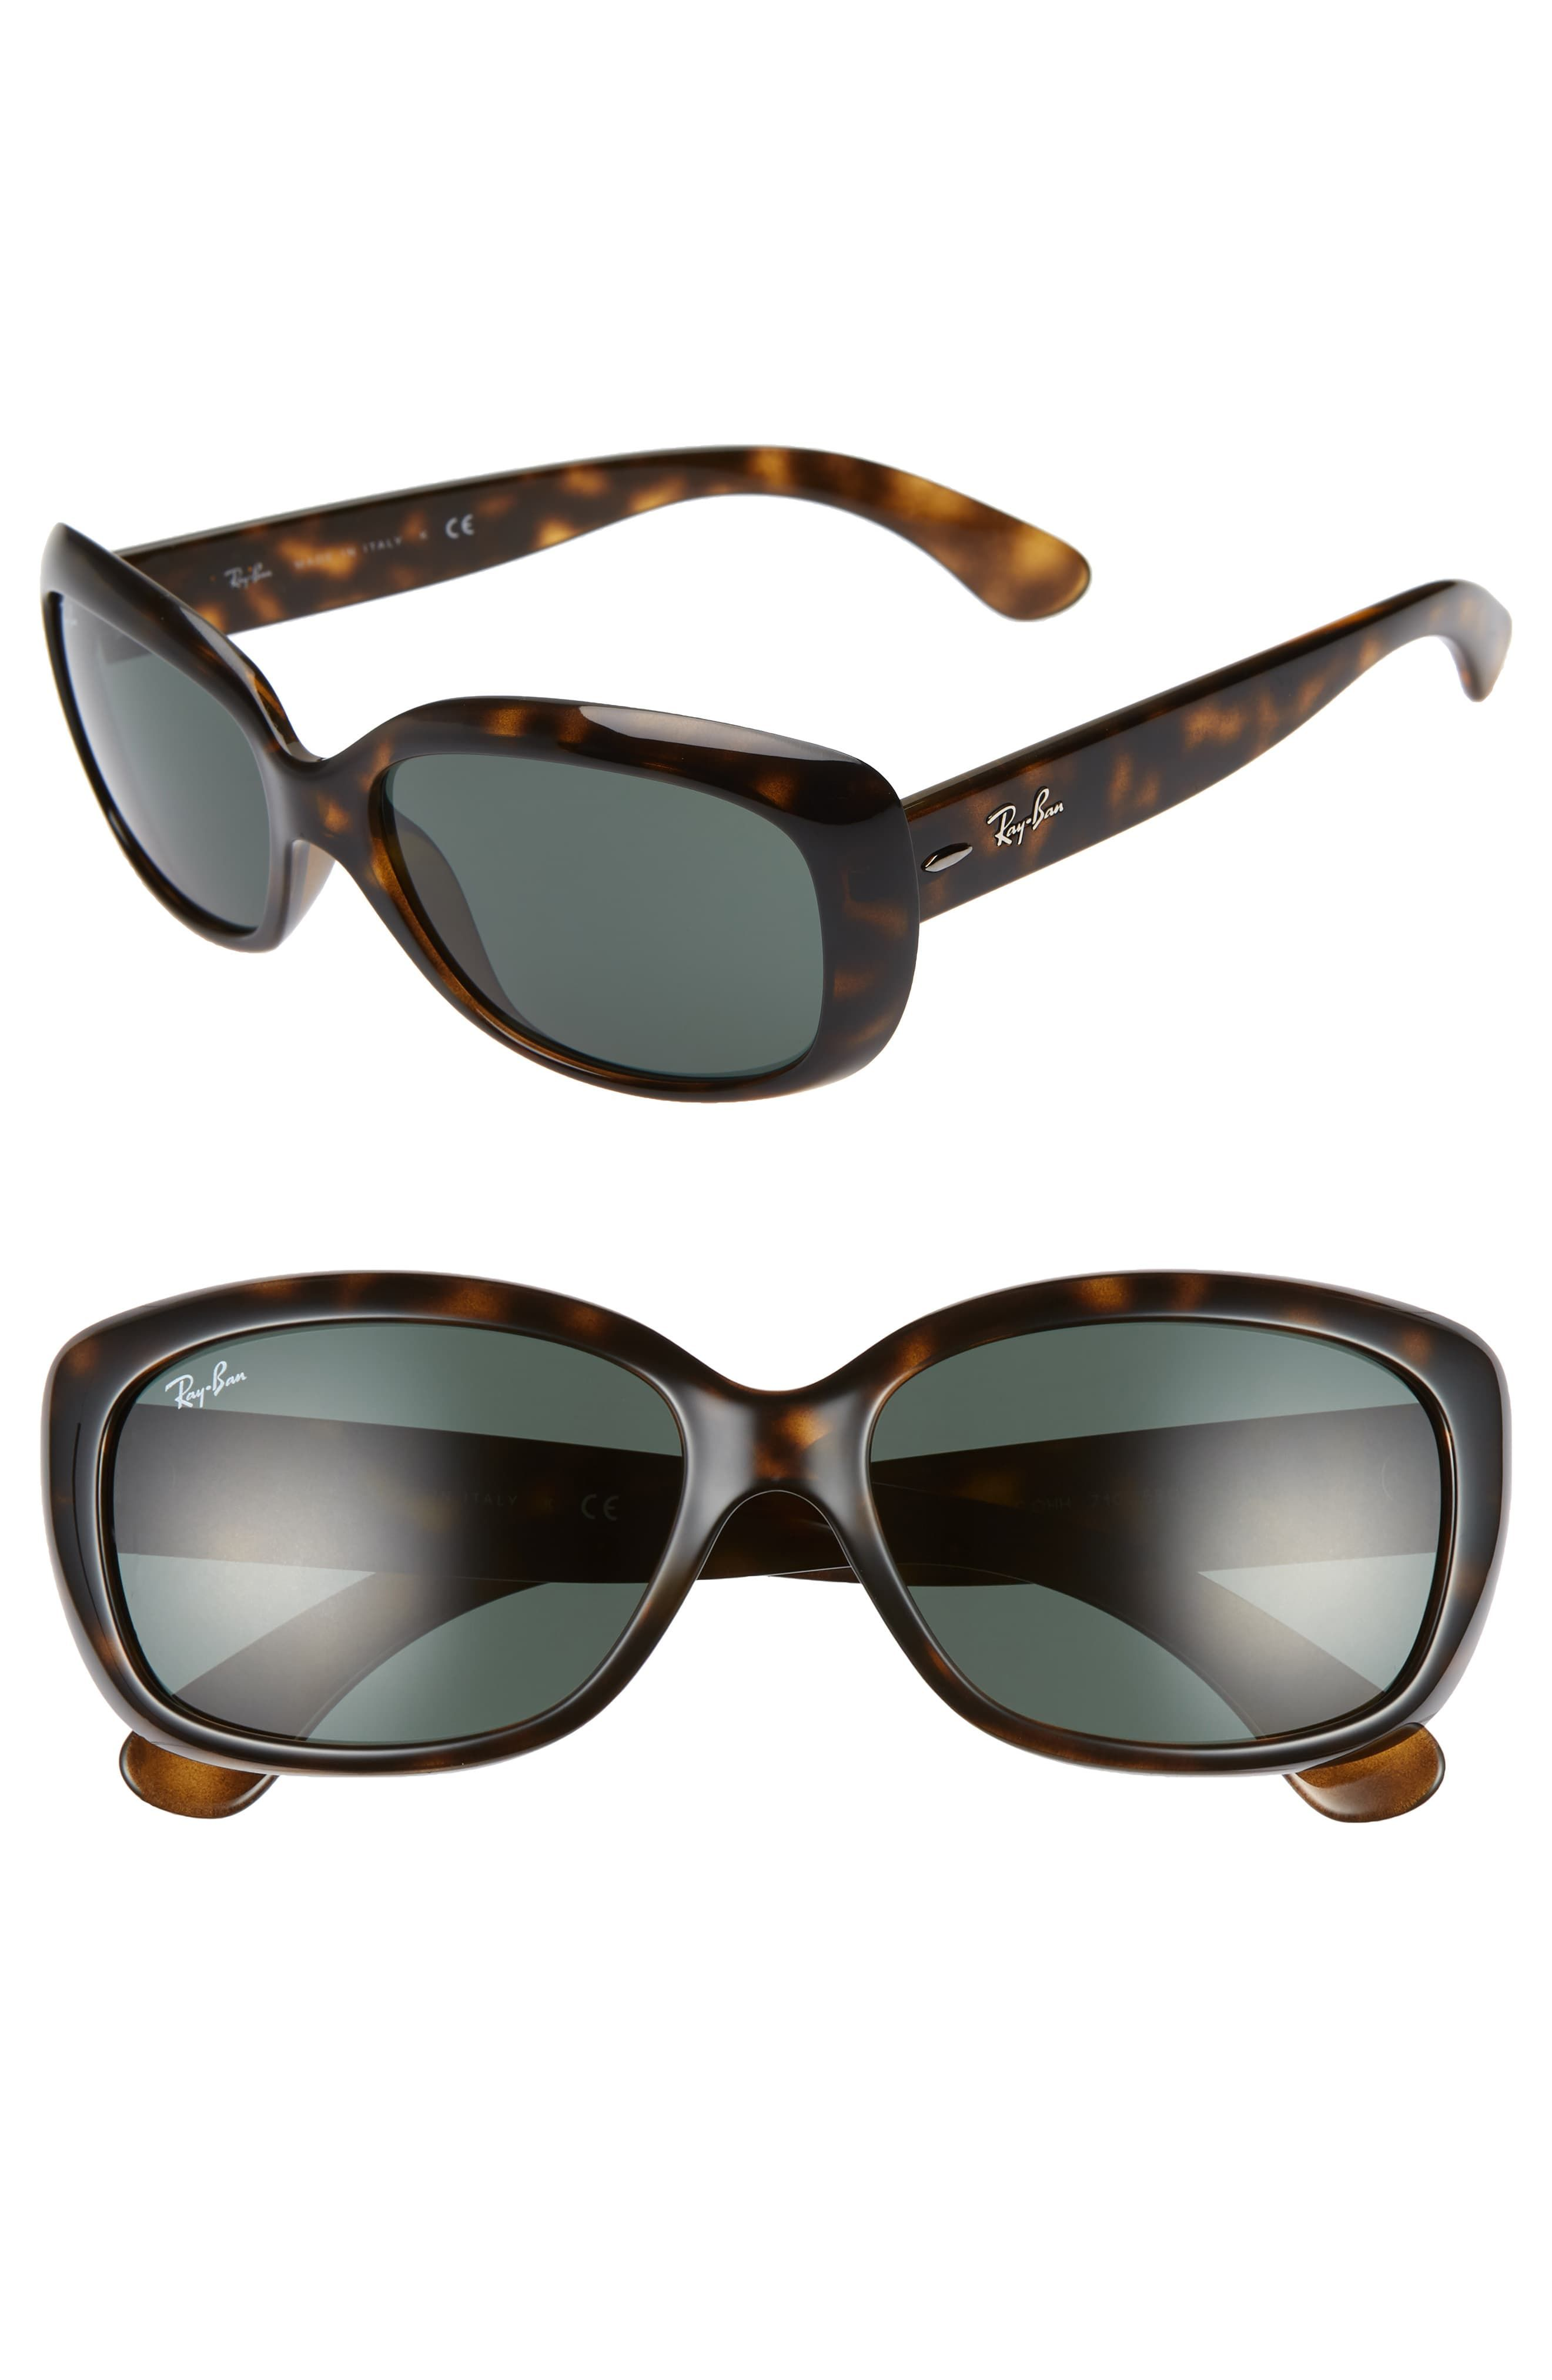 Ray Ban Jackie Ohh 58mm Cat Eye Sunglasses Sunglasses Cat Eye Sunglasses Jackie O Sunglasses